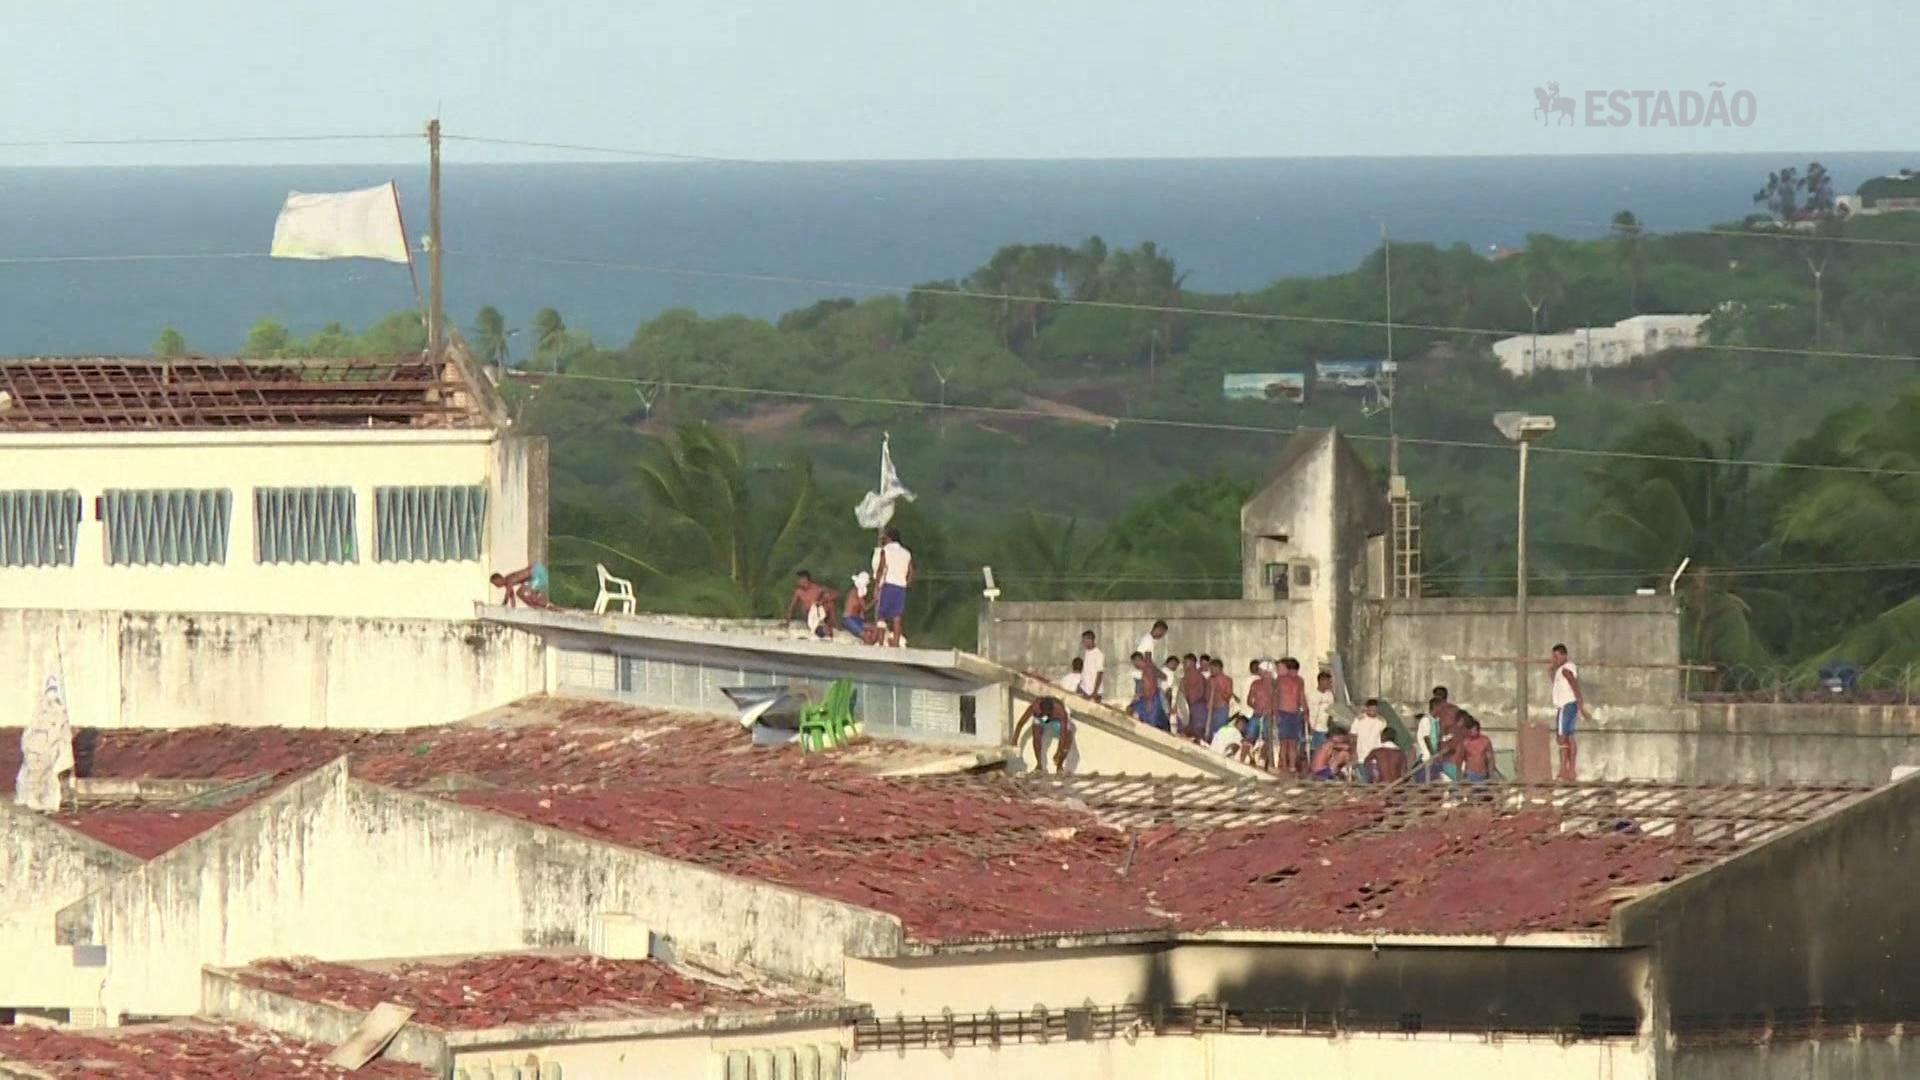 Barbárie assombra presídios brasileiros